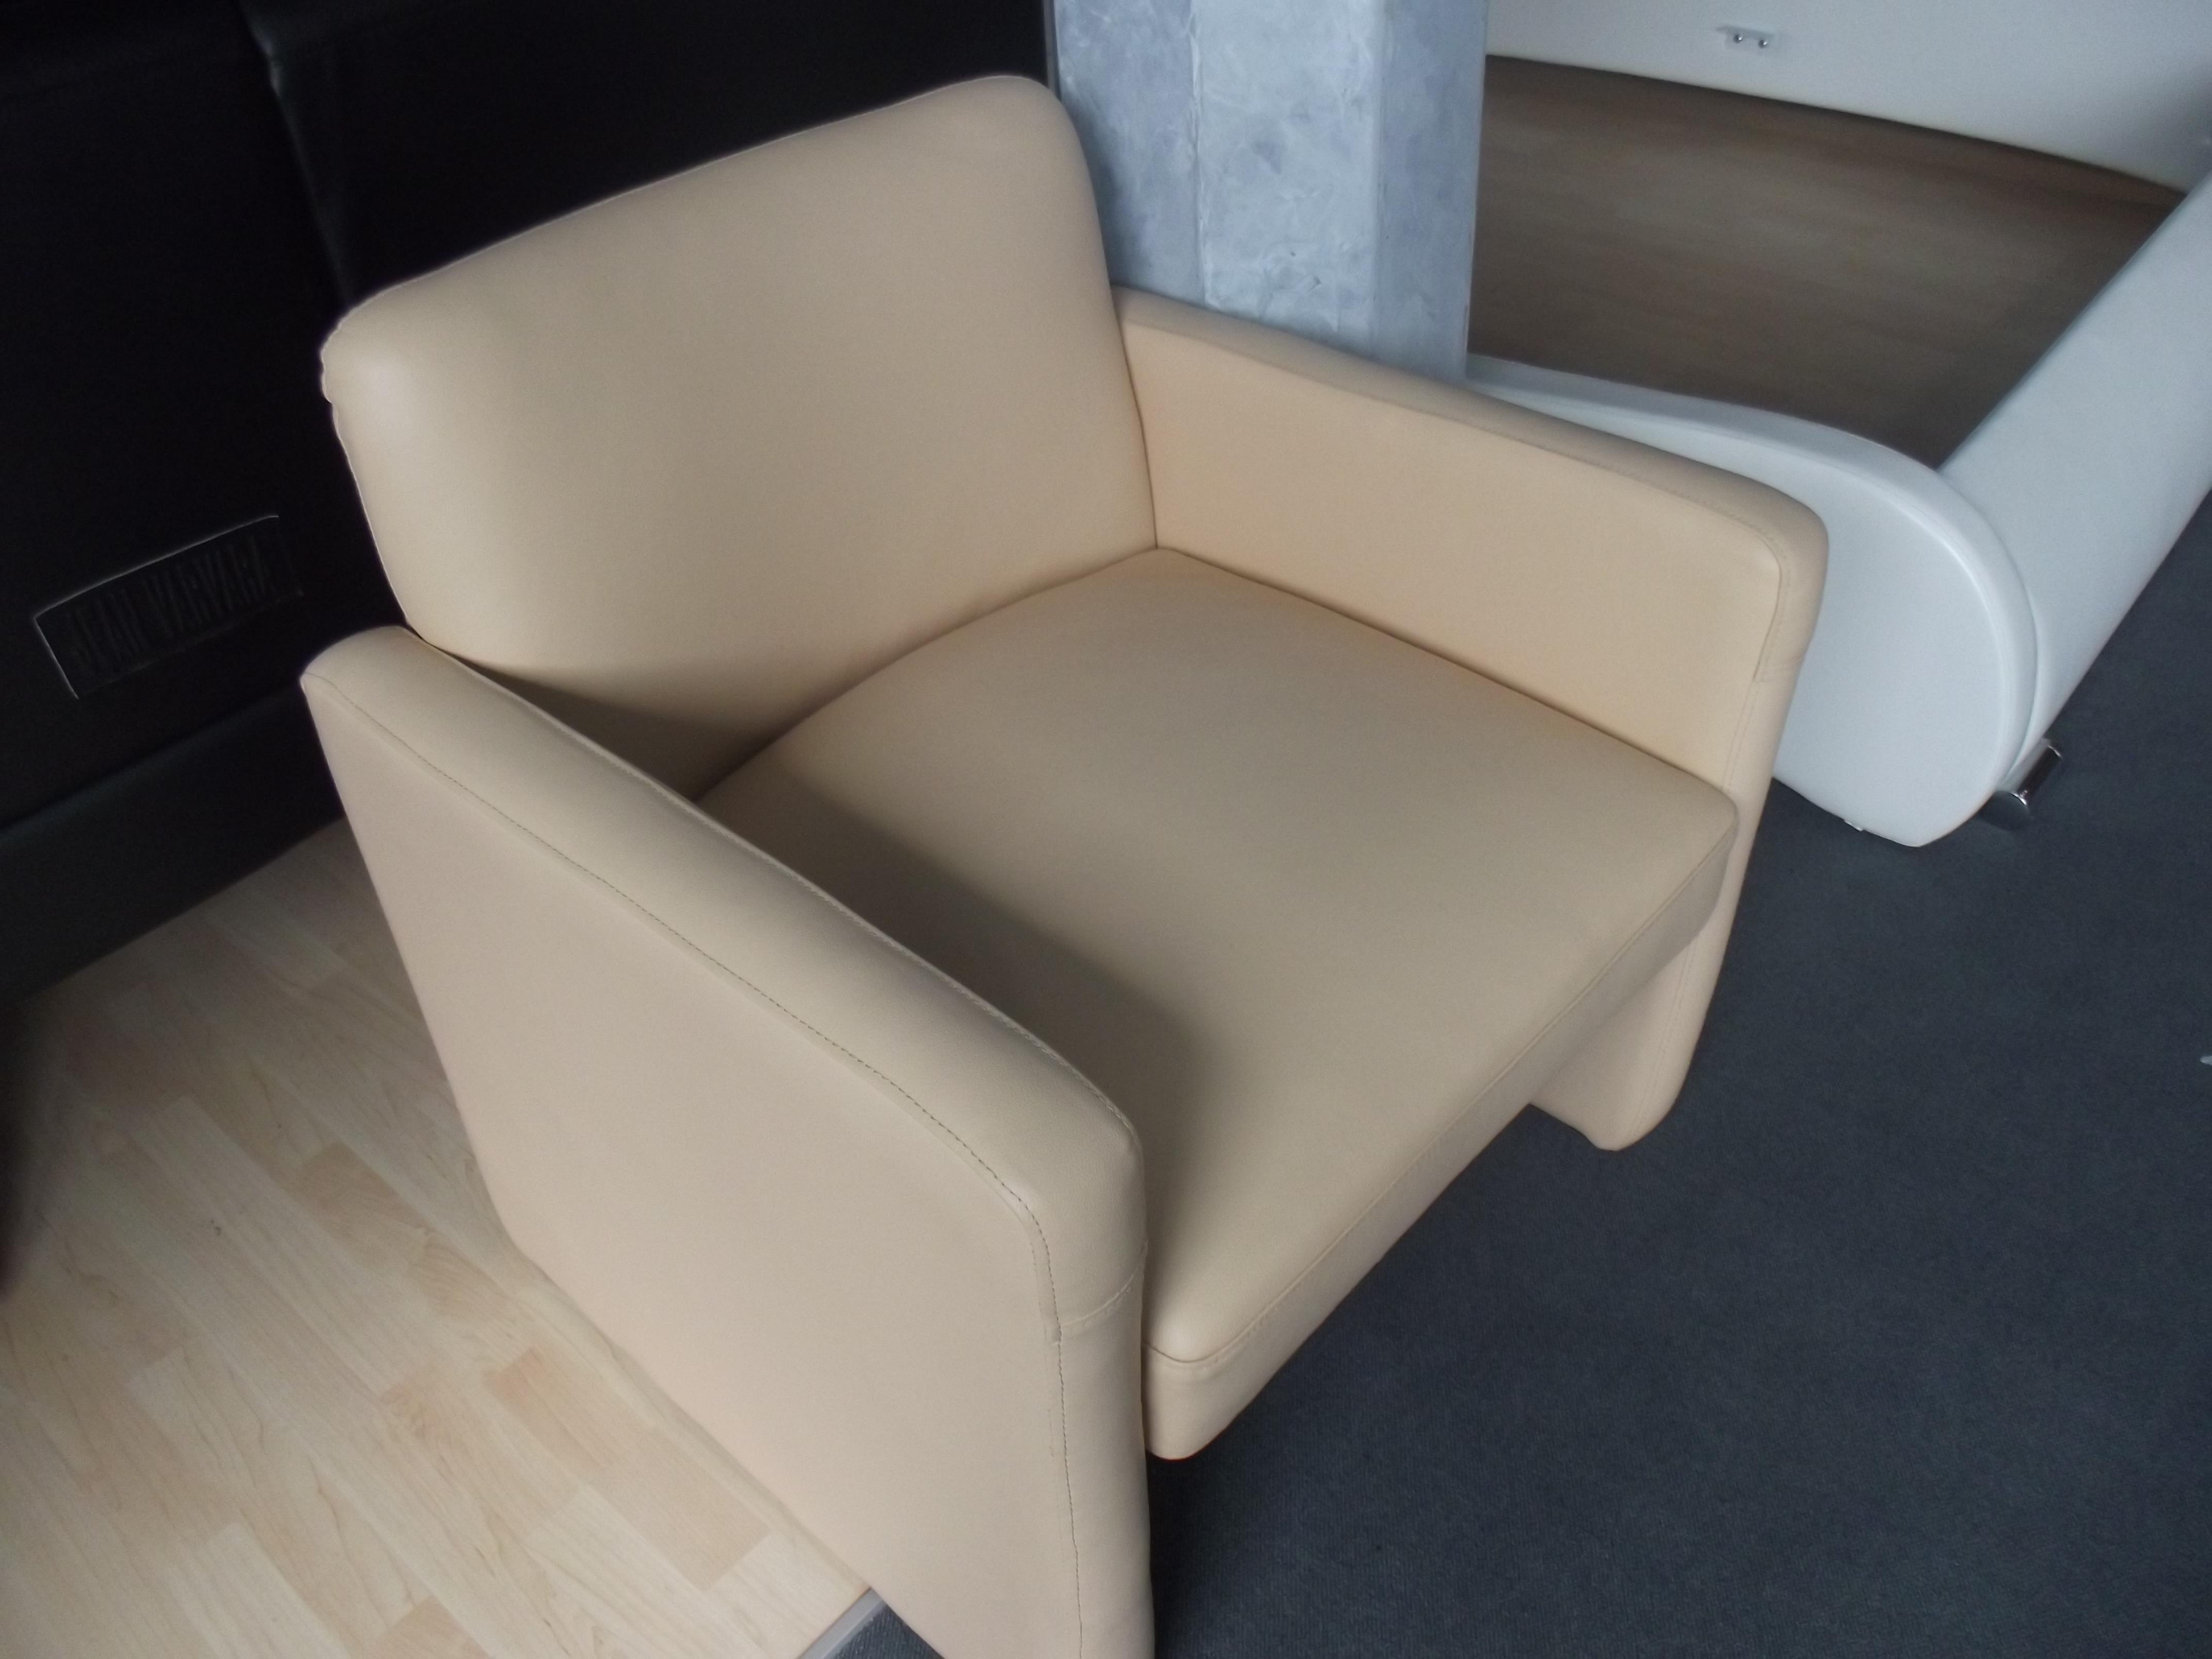 Verschiedene Sessel Couch Beste Wahl Sessel-couch-fernsehsessel-relax-sessel-toledo-couch-modern-